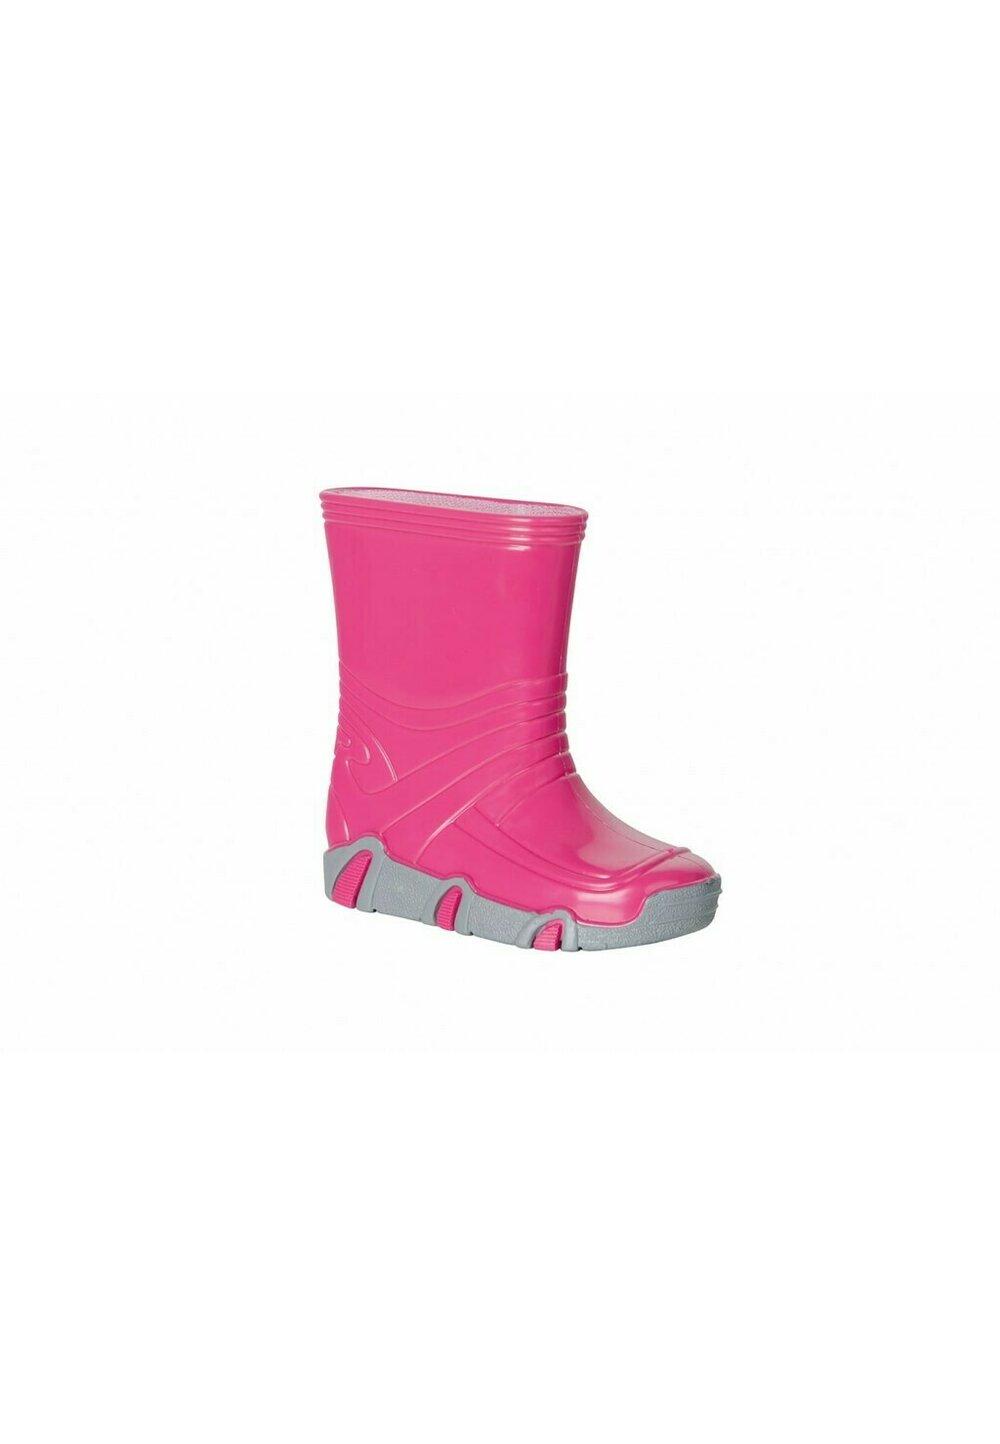 Cizme de cauciuc, roz neon imagine